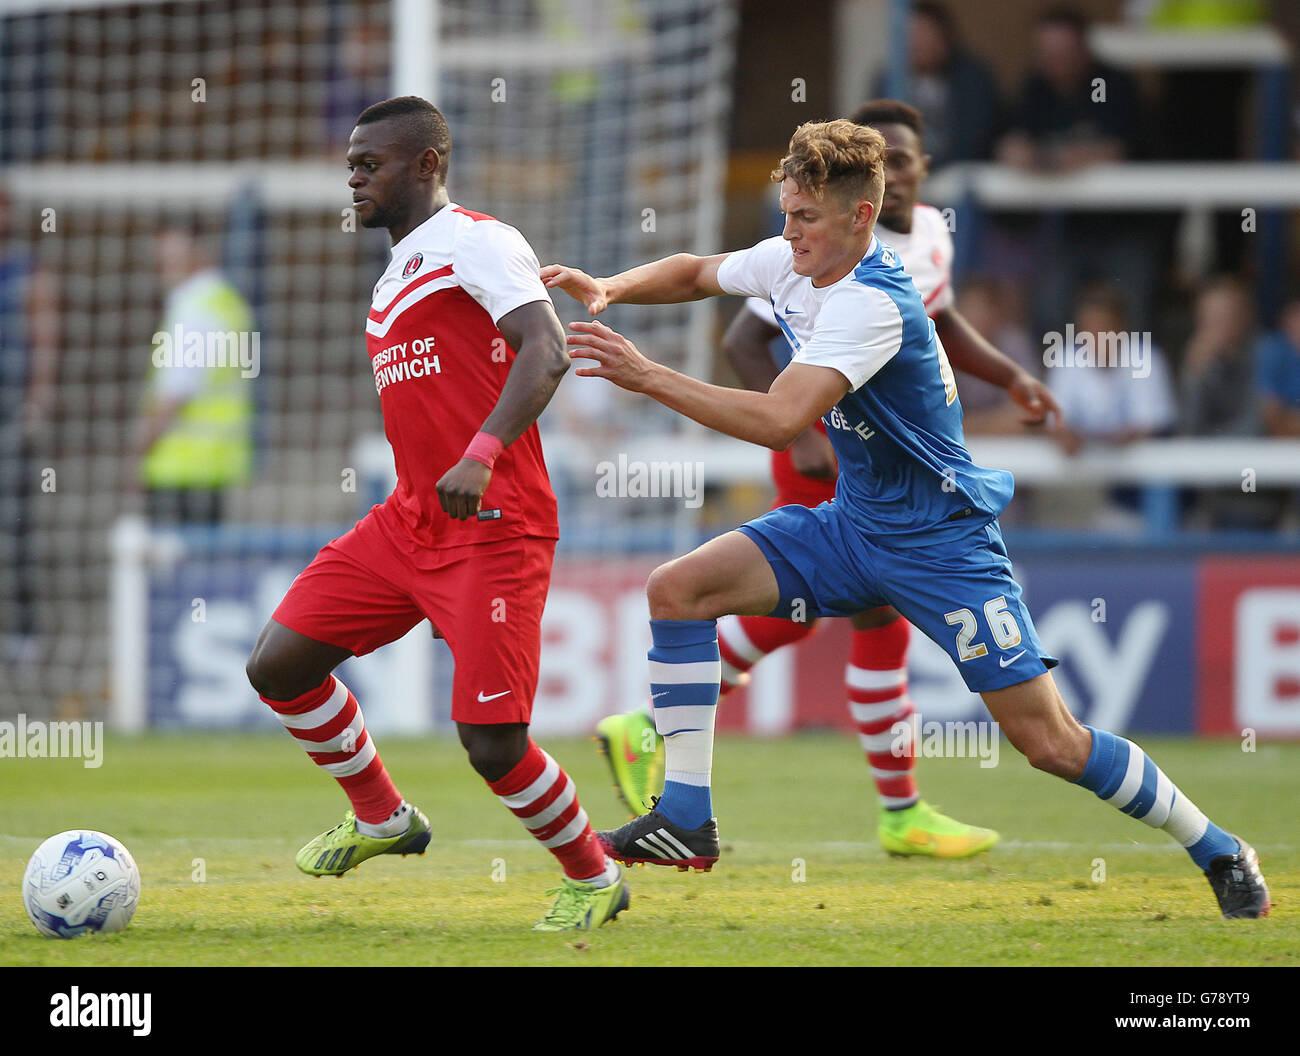 Soccer - Pre Season Friendly - Peterborough United v Charlton Athletic - London Road Stock Photo